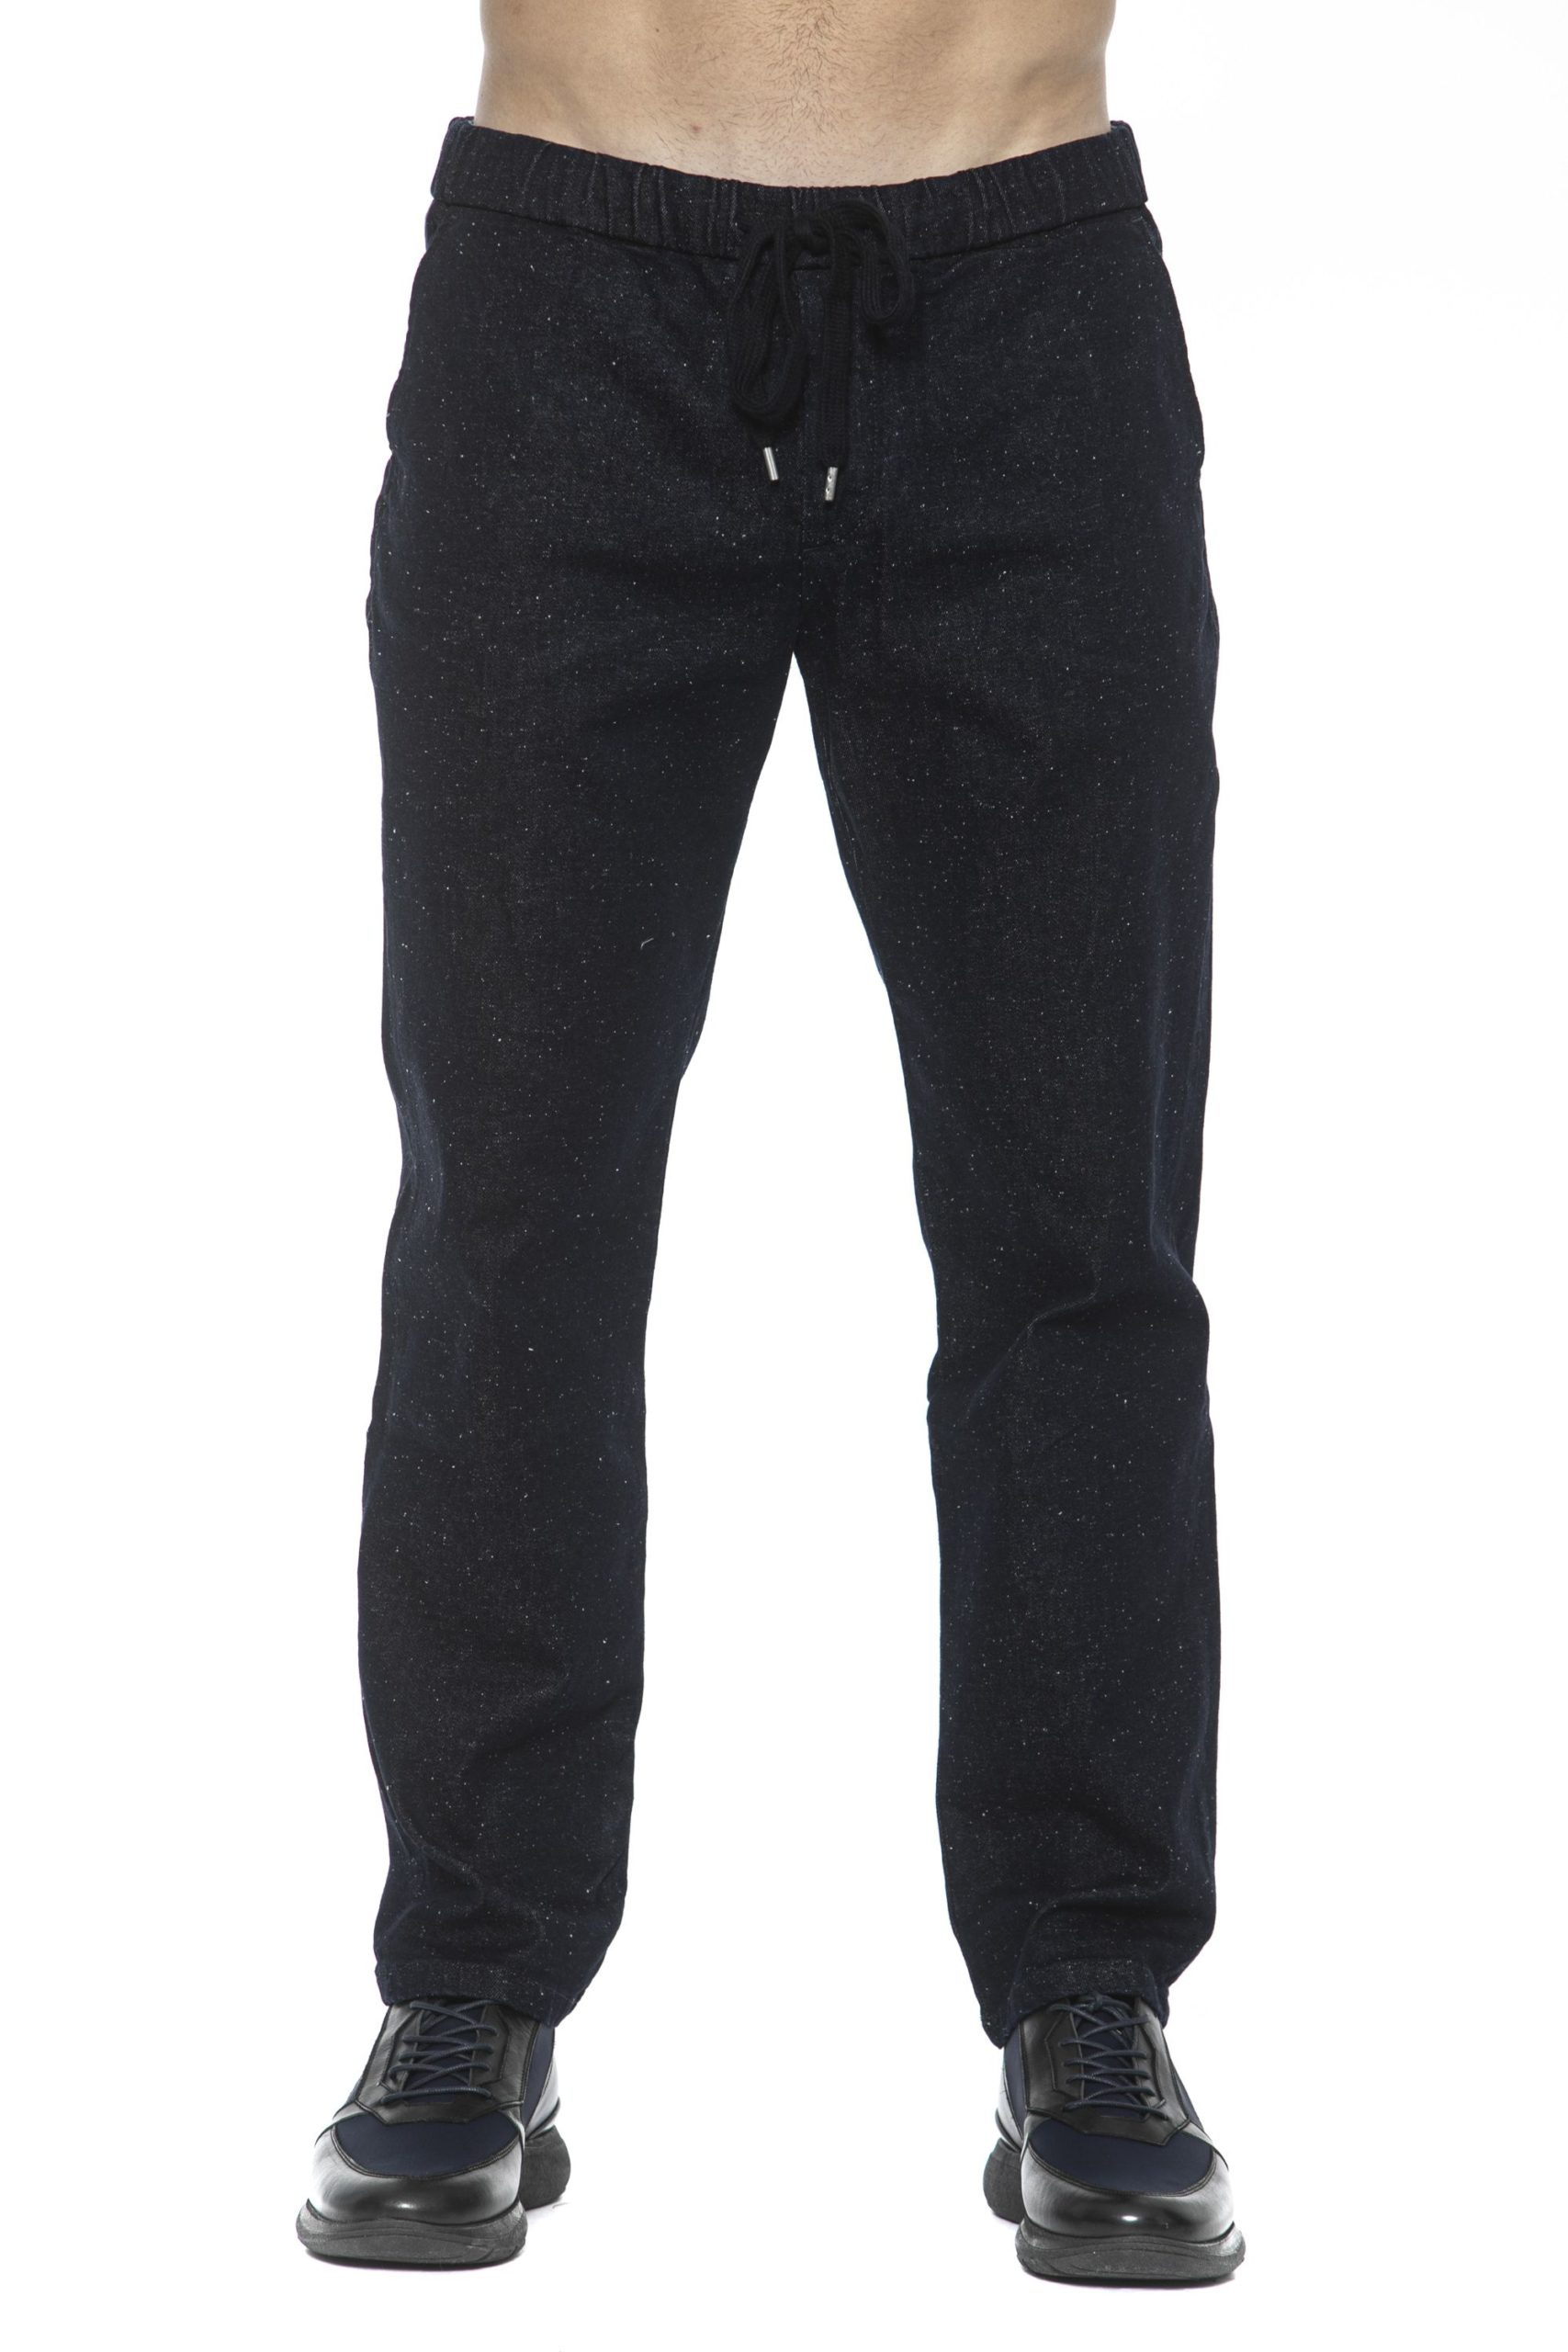 Care Label Men's Dark Trouser Blue CA1394899 - S